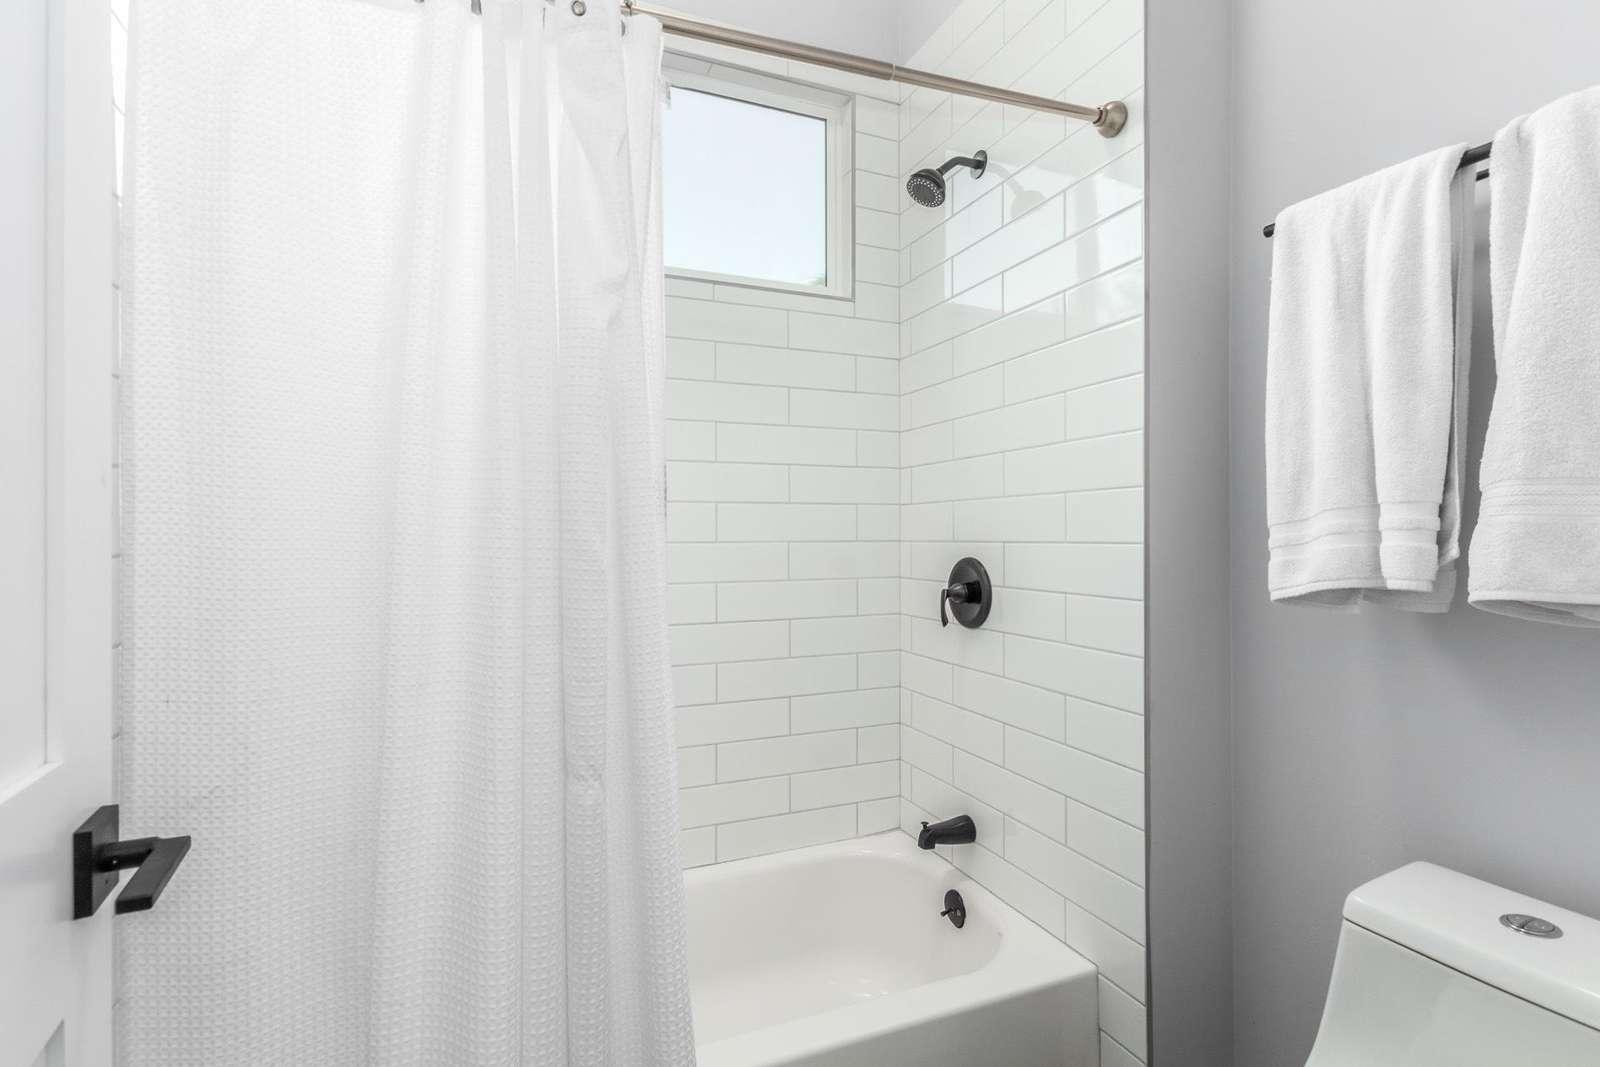 2nd Jack & Jill Tub-Shower, Toilet Closet.